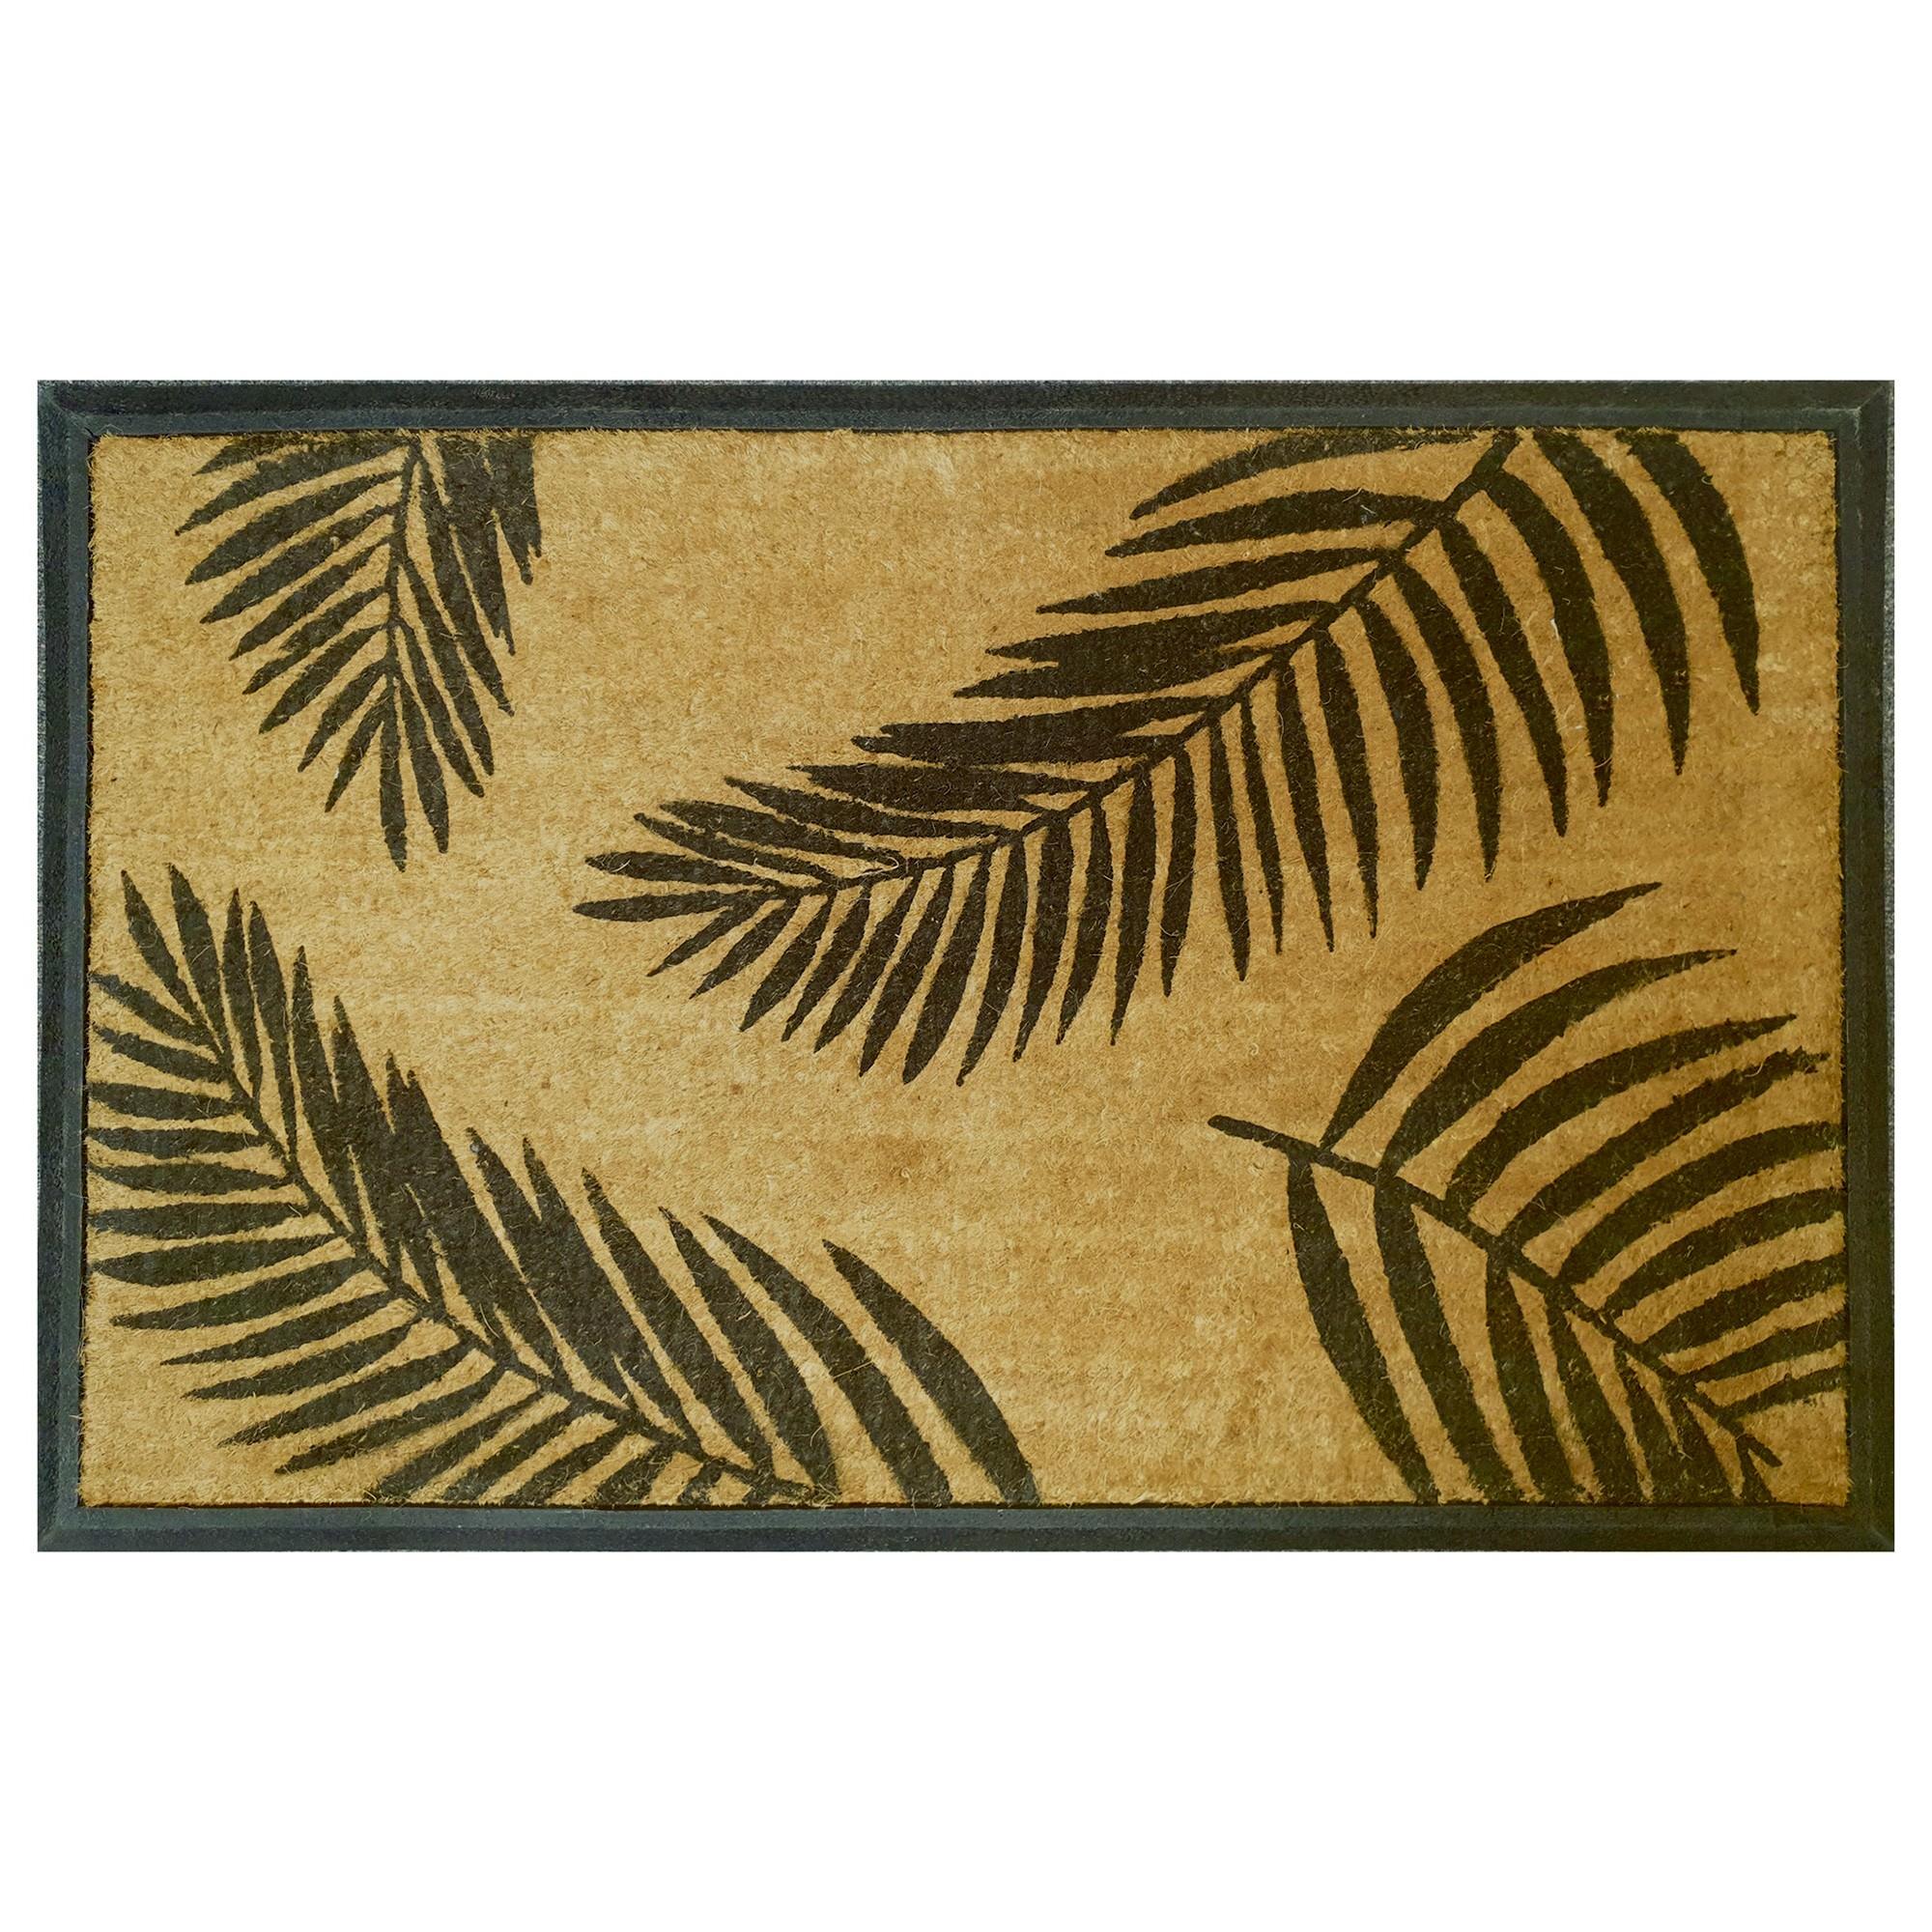 Palm Leaves Rubber Edged Coir Doormat, 120x75cm